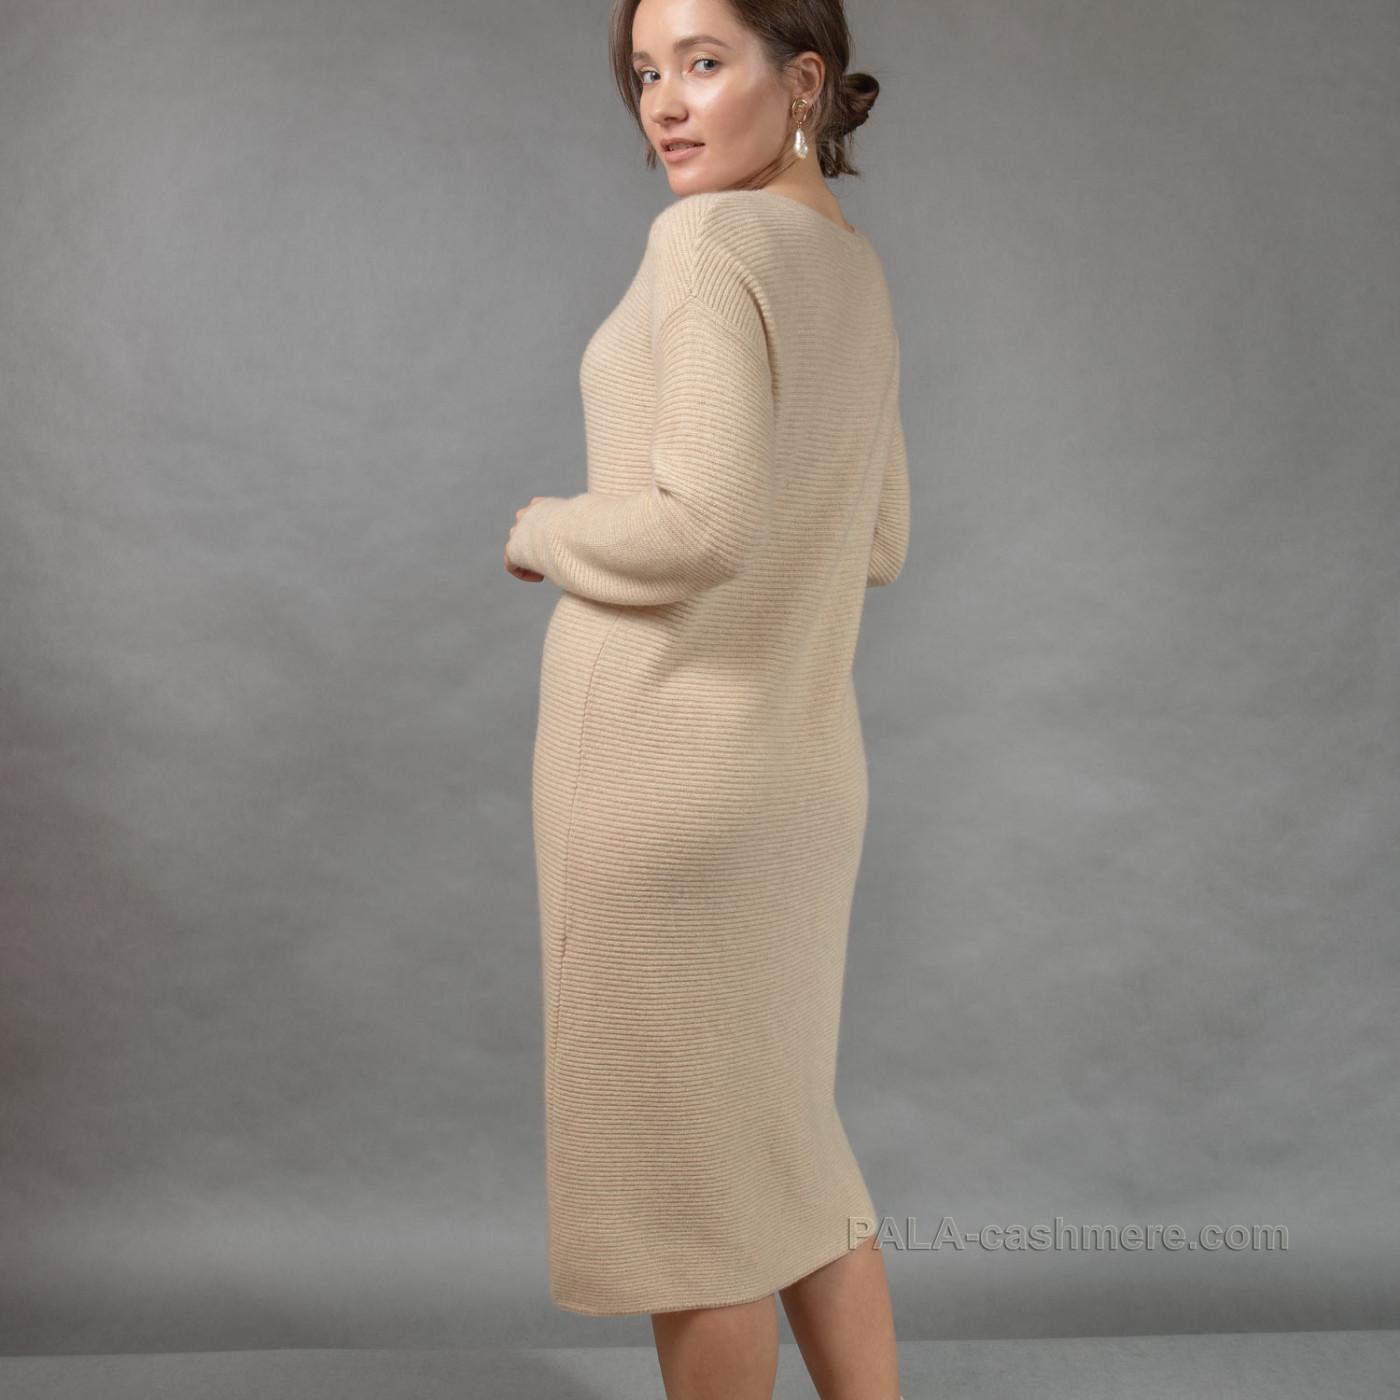 Cashmere dress is light